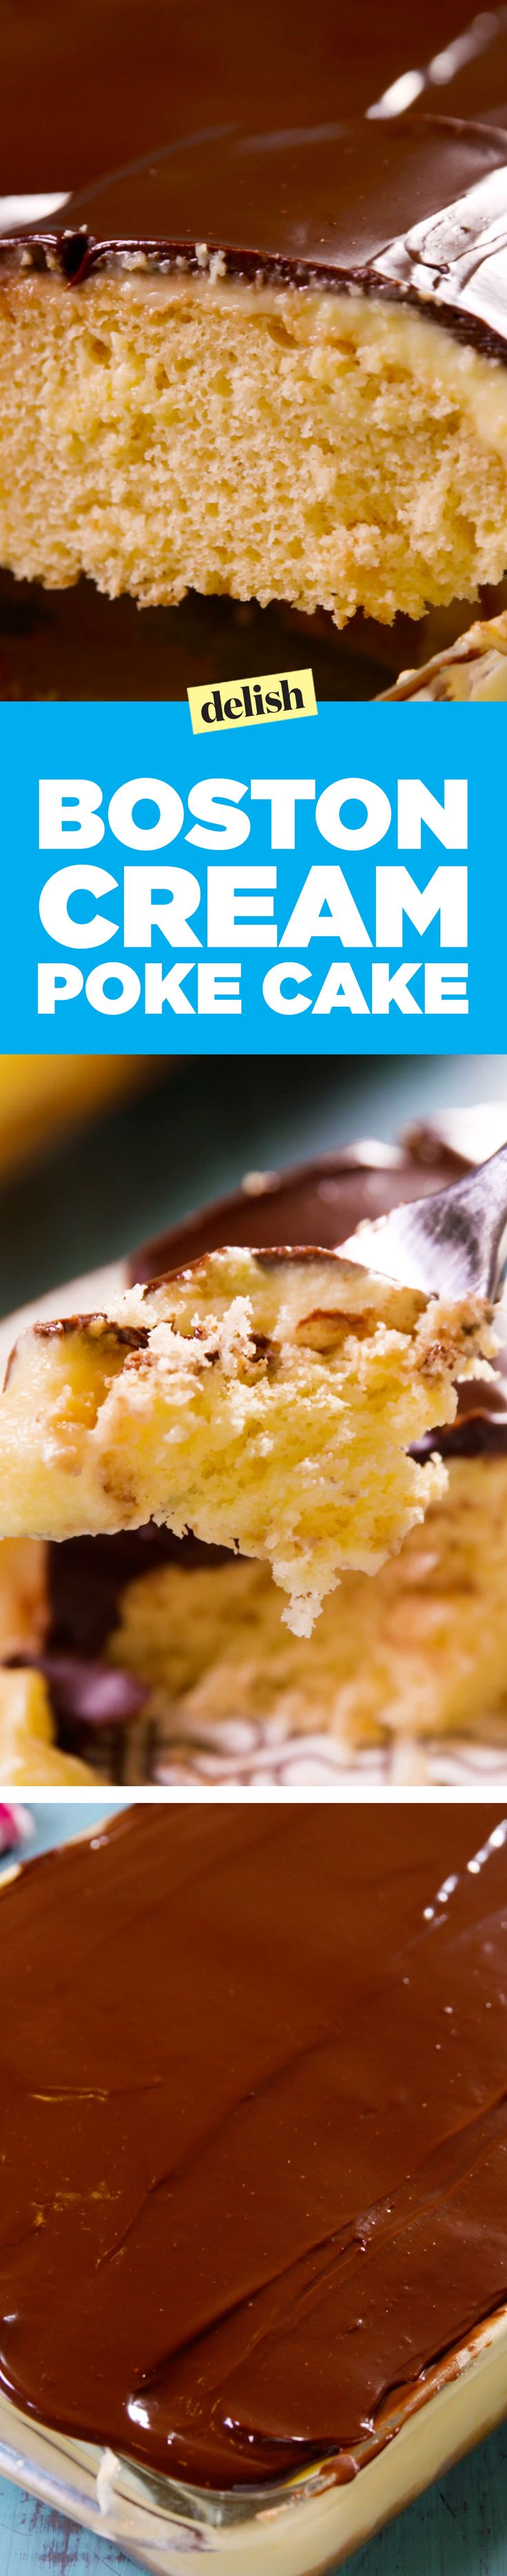 Boston cream pie poke cake recipe